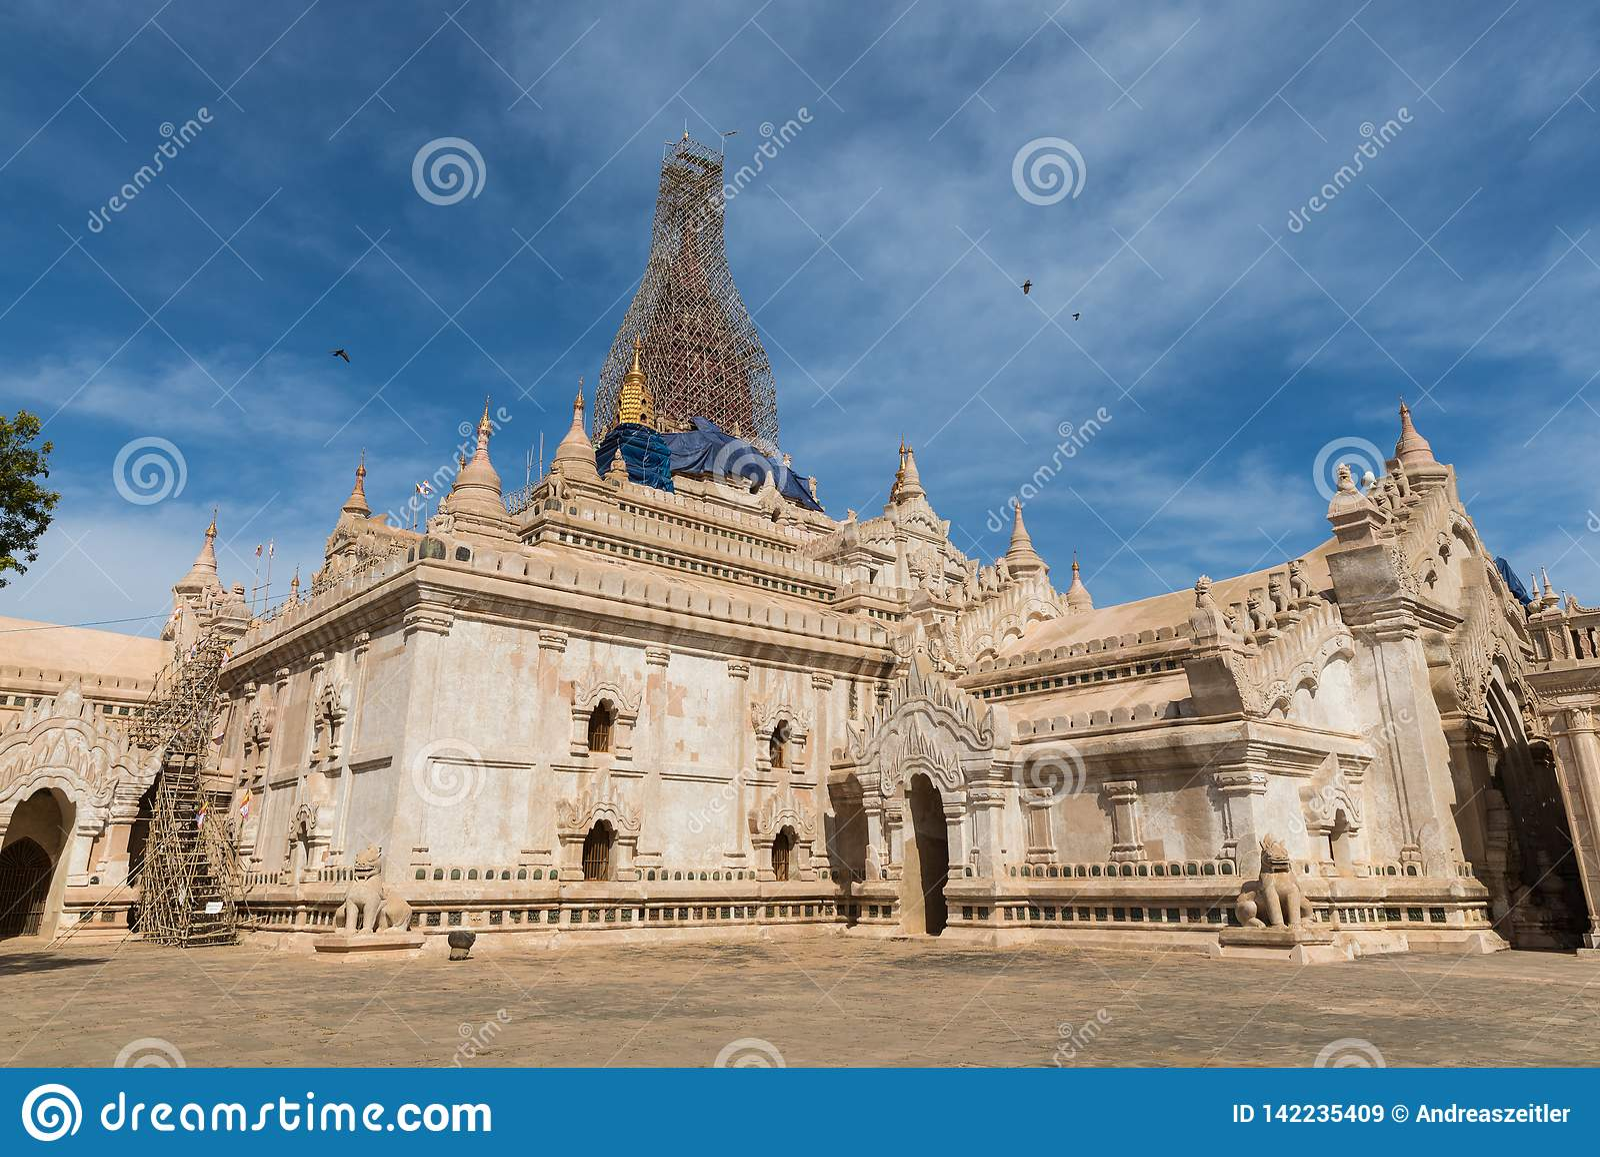 Ananda Pagoda Bagan antico (pagano), Mandalay, Myanmar (Birmania